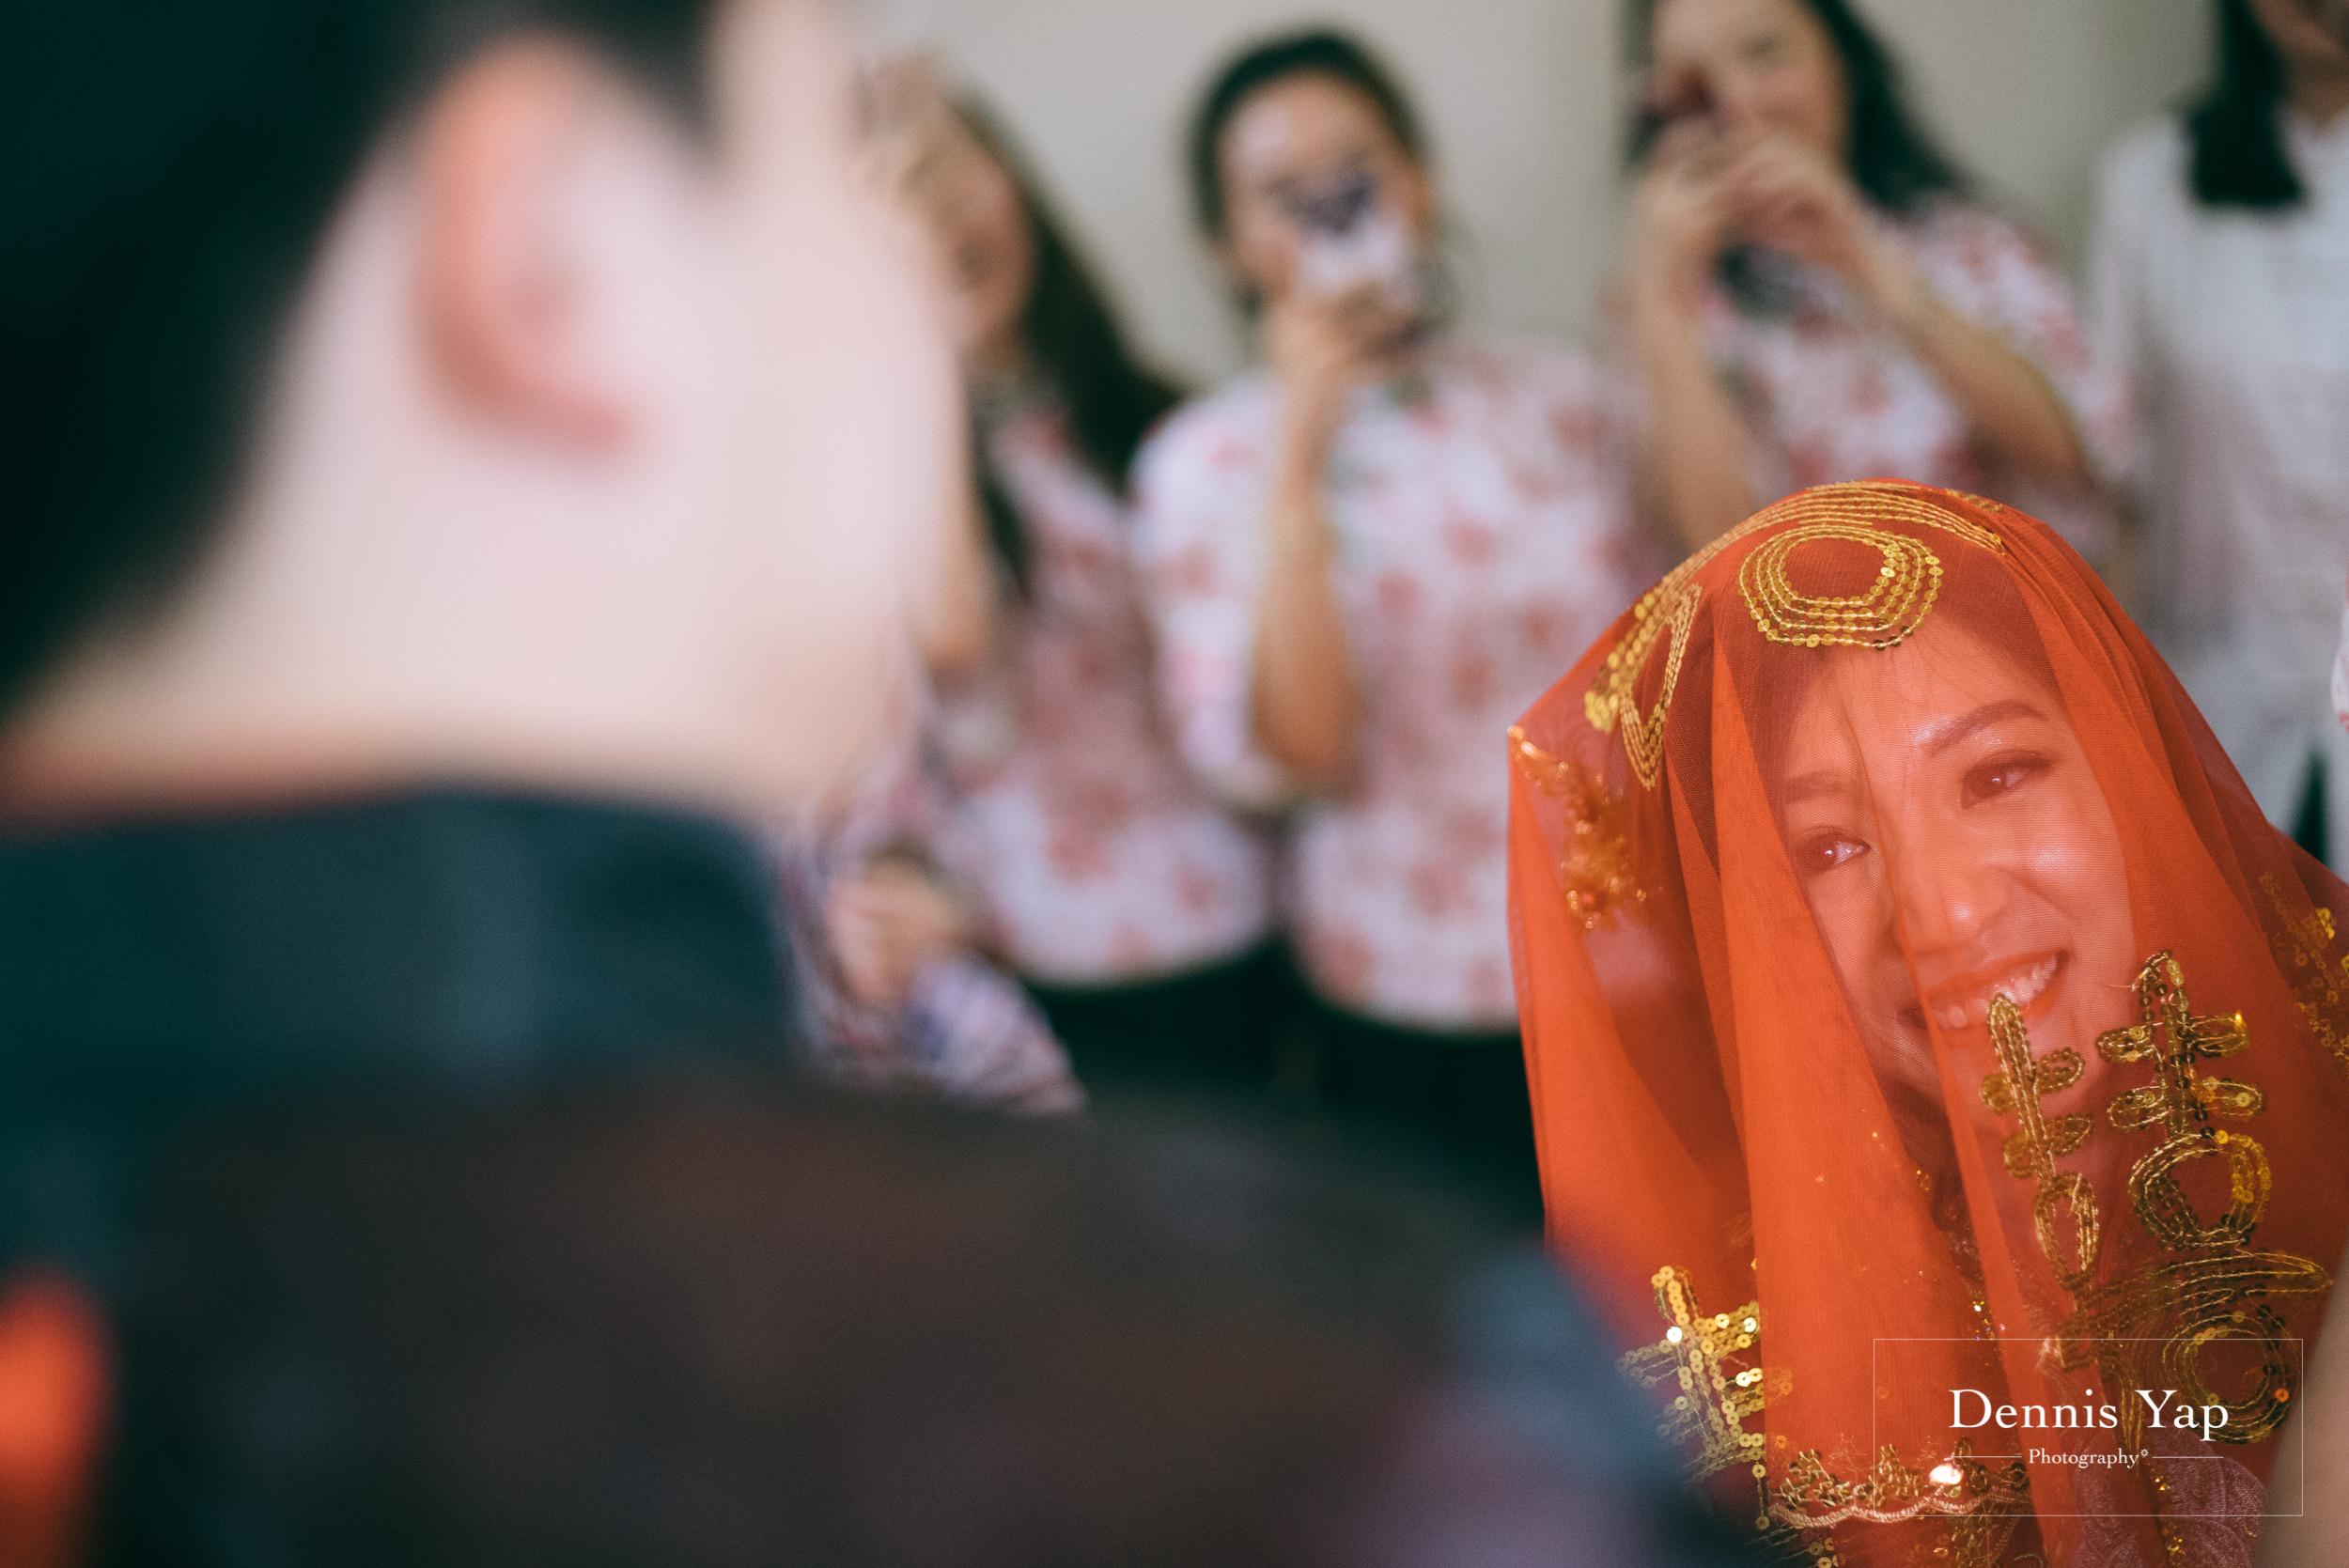 kuan rachel wedding day kuala lumpur melbourne gate crash dennis yap malaysia wedding photographer-17.jpg